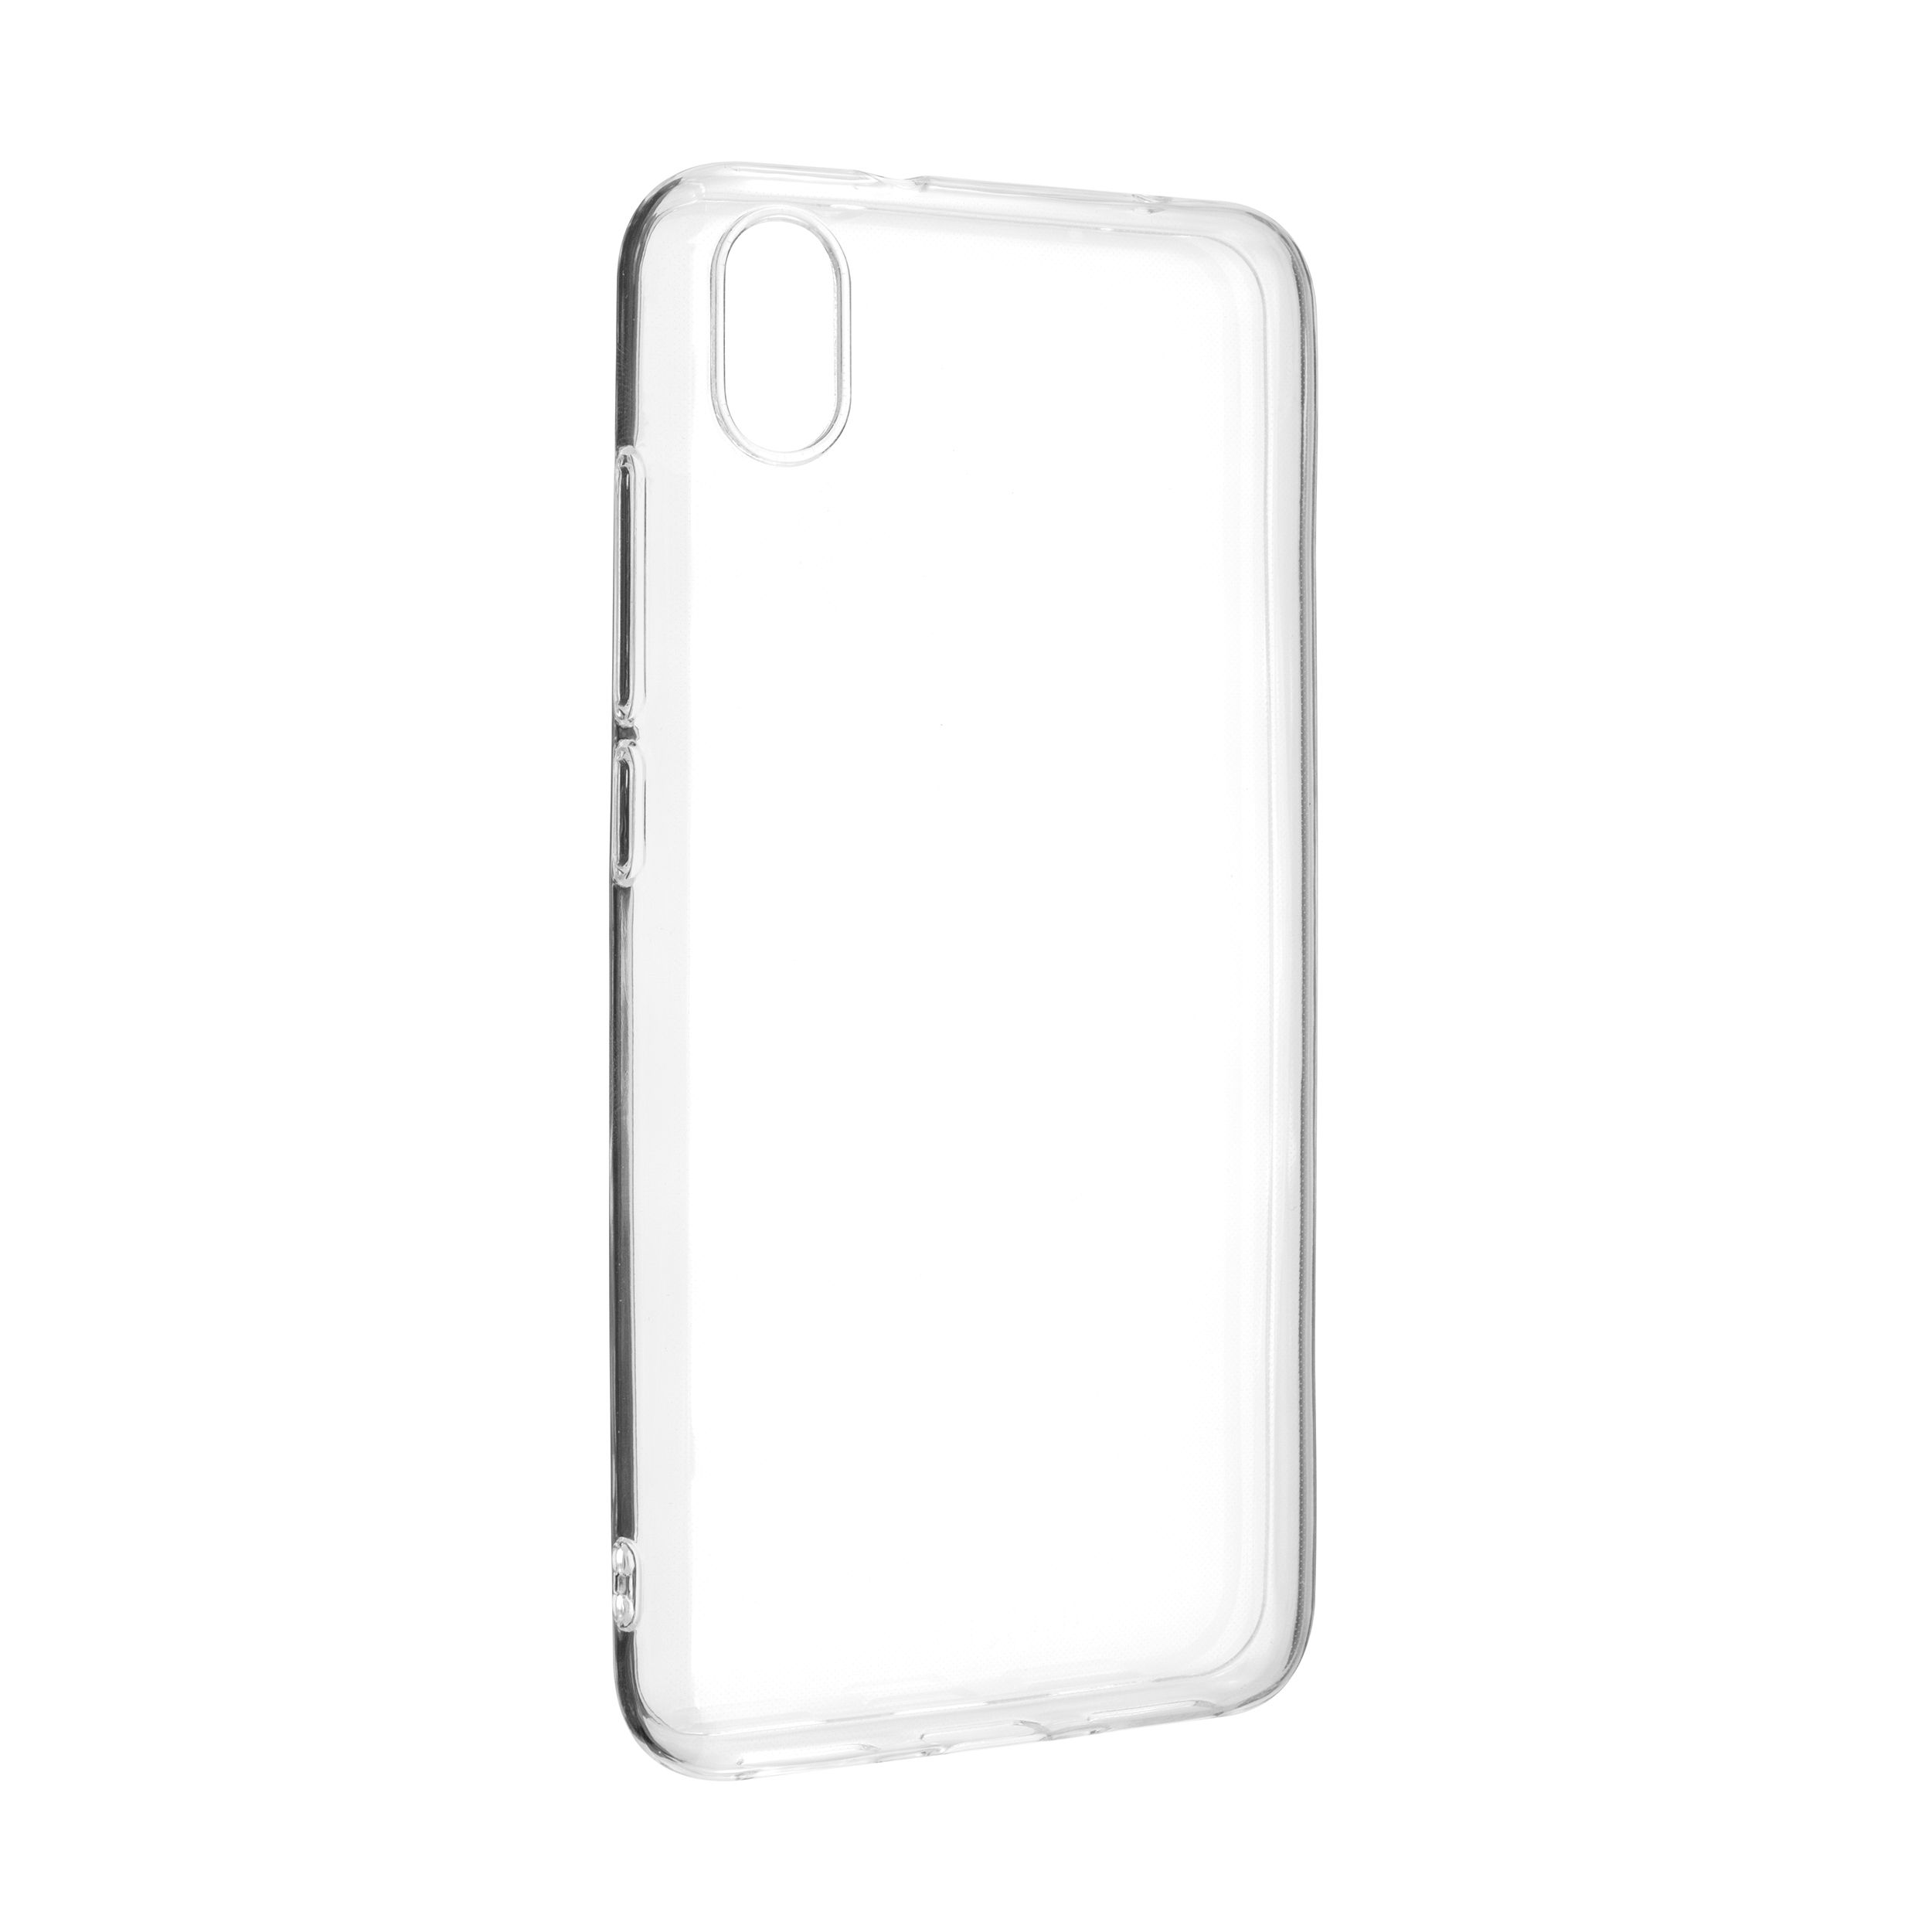 TPU gelové pouzdro FIXED pro Xiaomi Redmi 7A, čiré